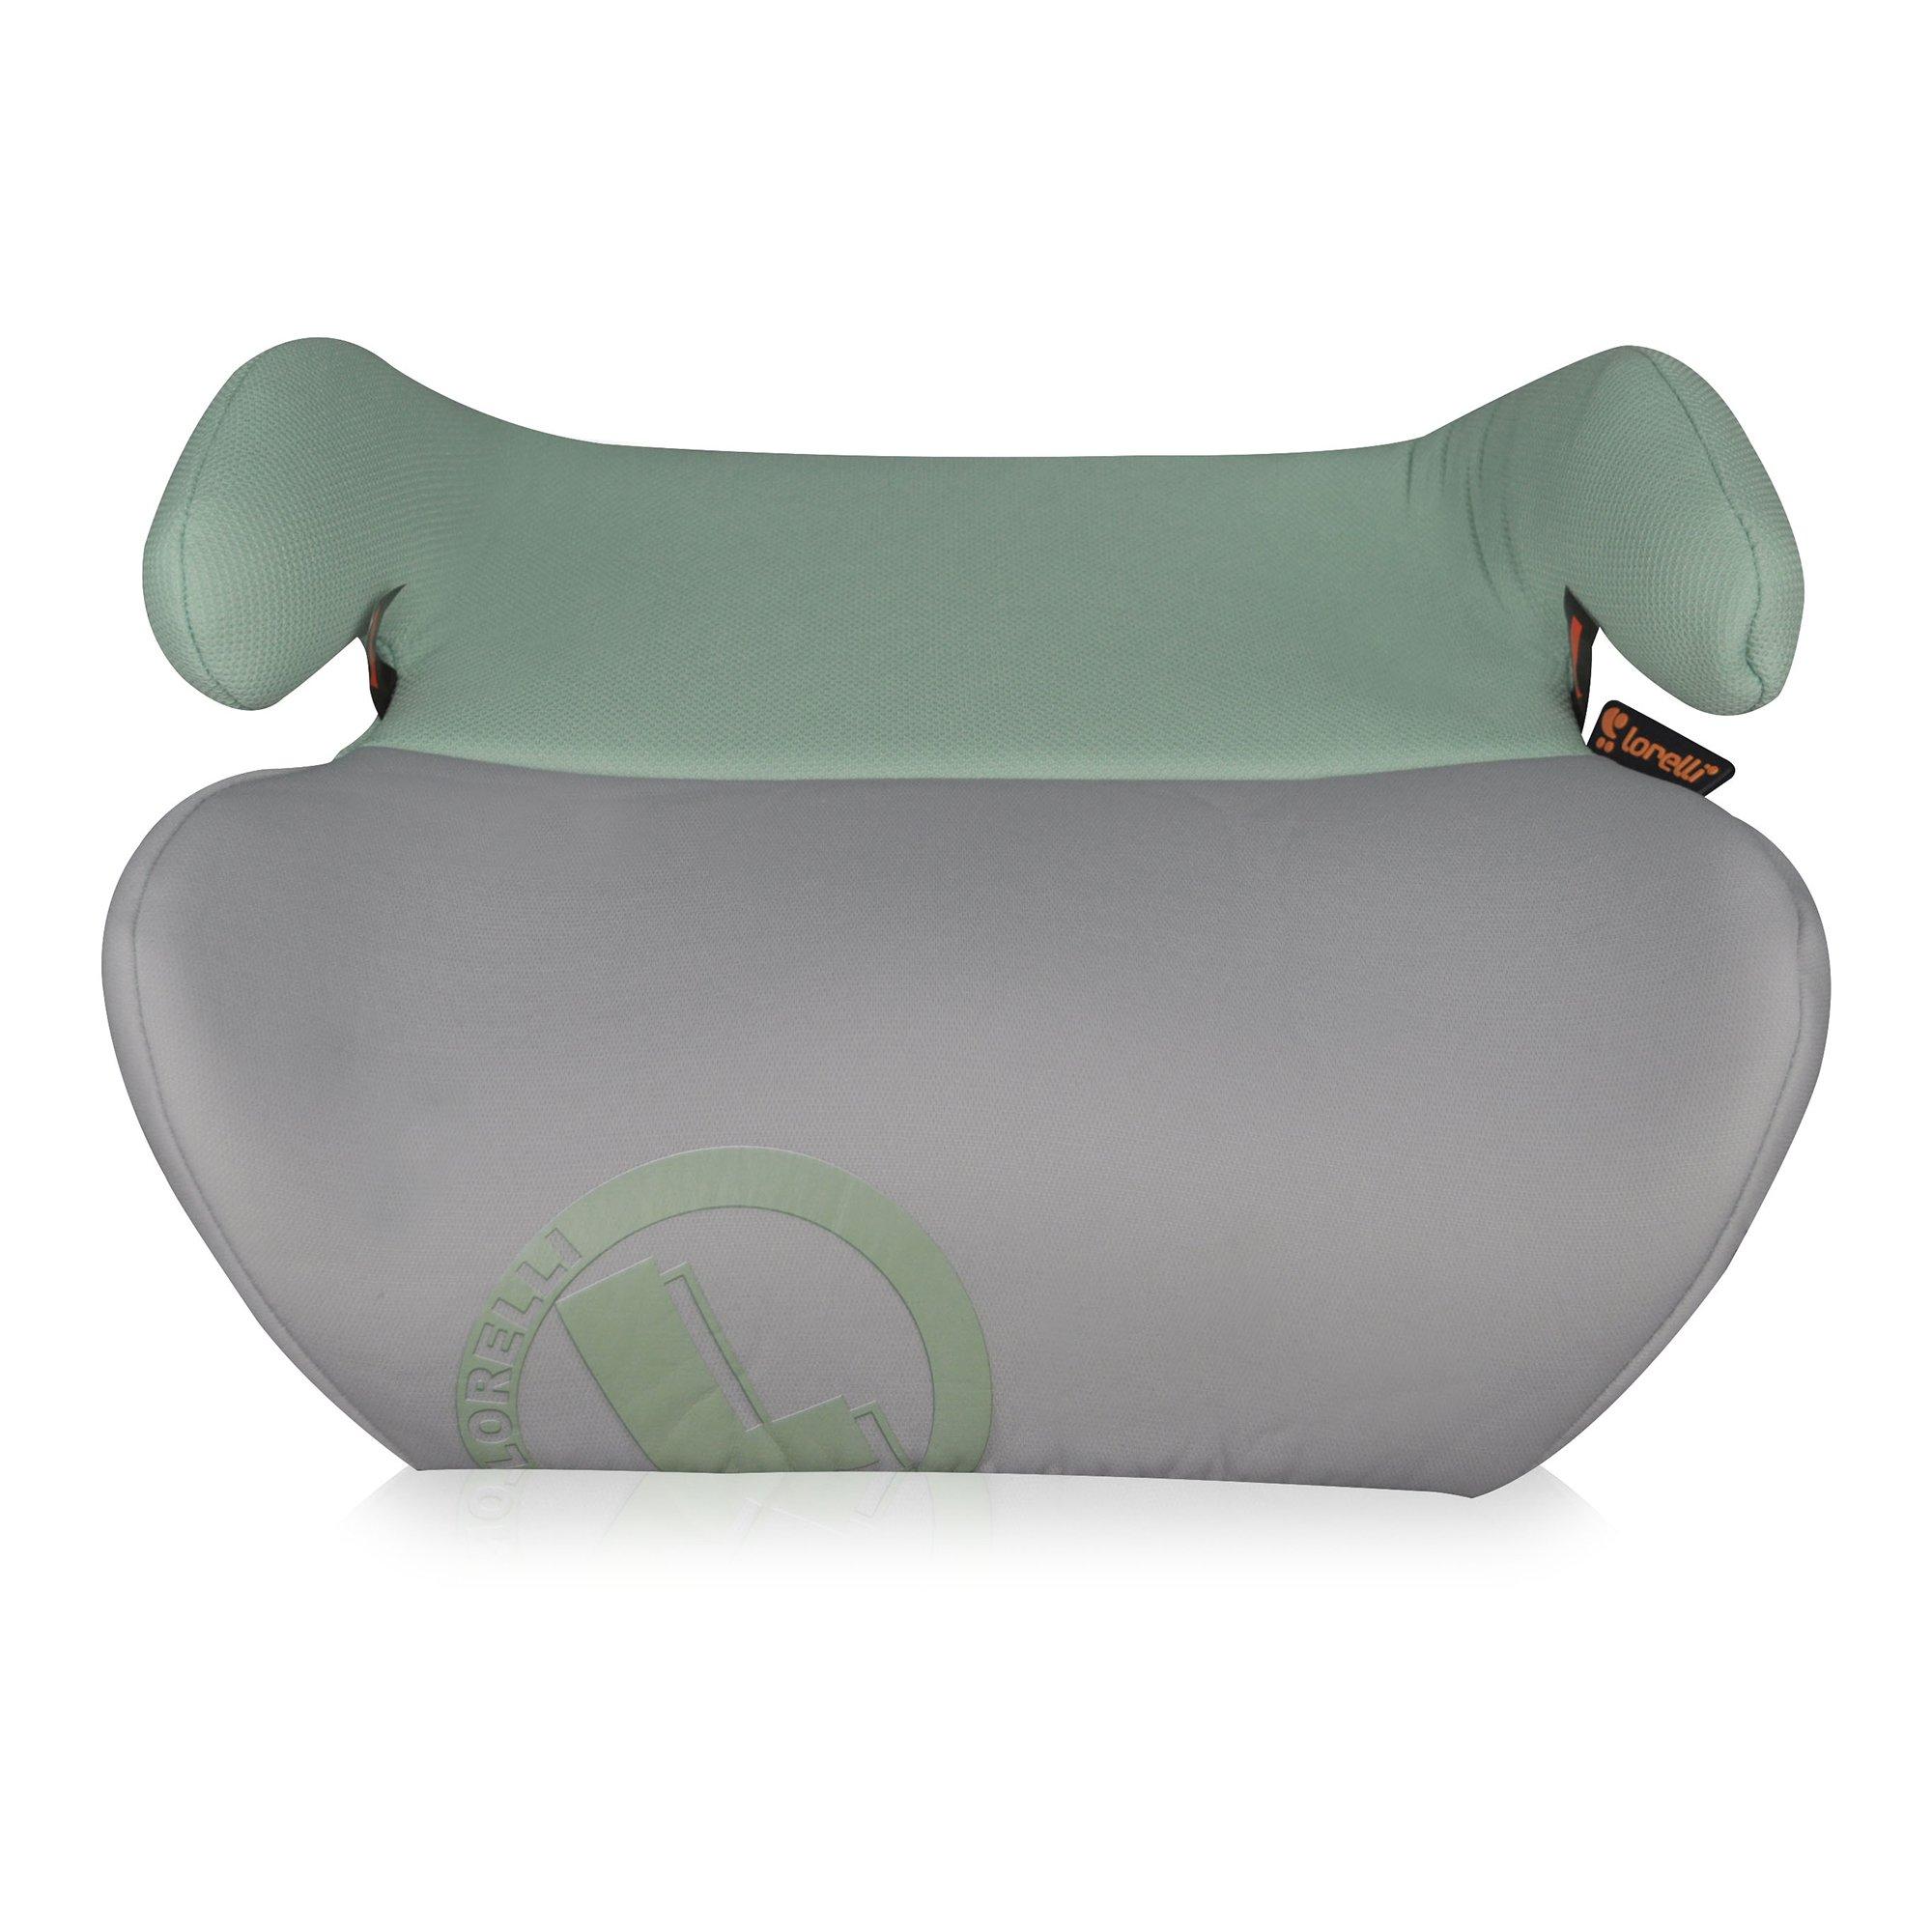 inaltator auto lorelli classic easy, green & grey